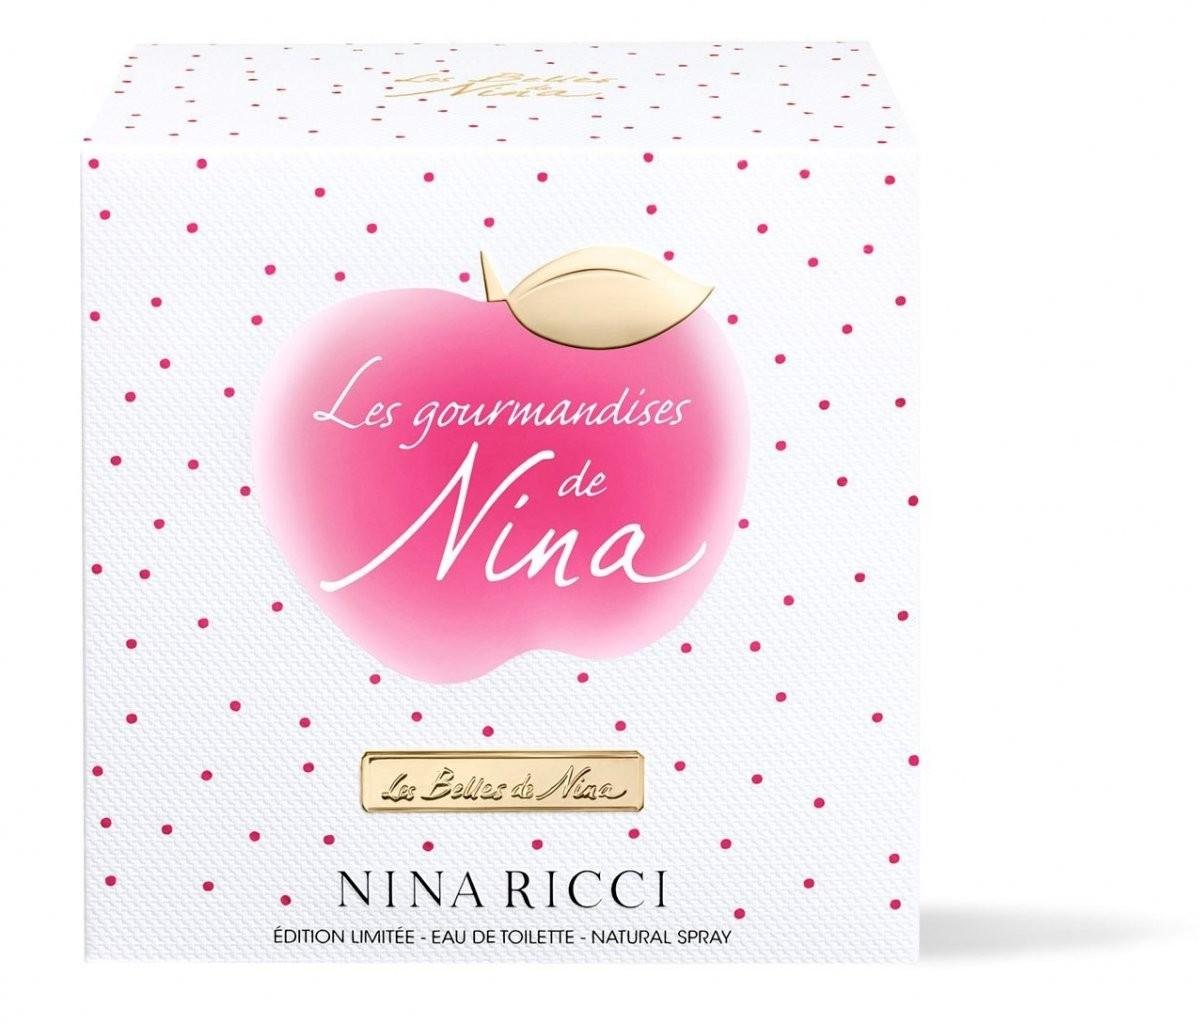 Nina Ricci Les Gourmandises De Nina аромат для женщин